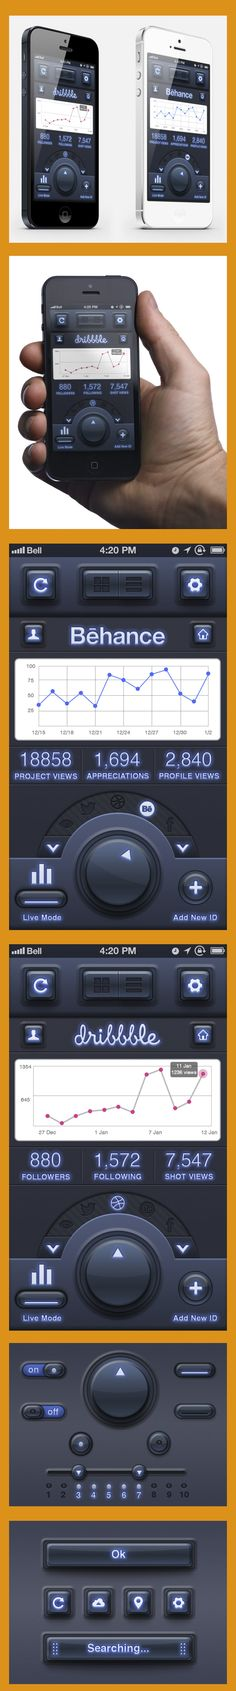 """Tracker"" App - Mobile UI Design - by Tobia Crivellari, via Behance"